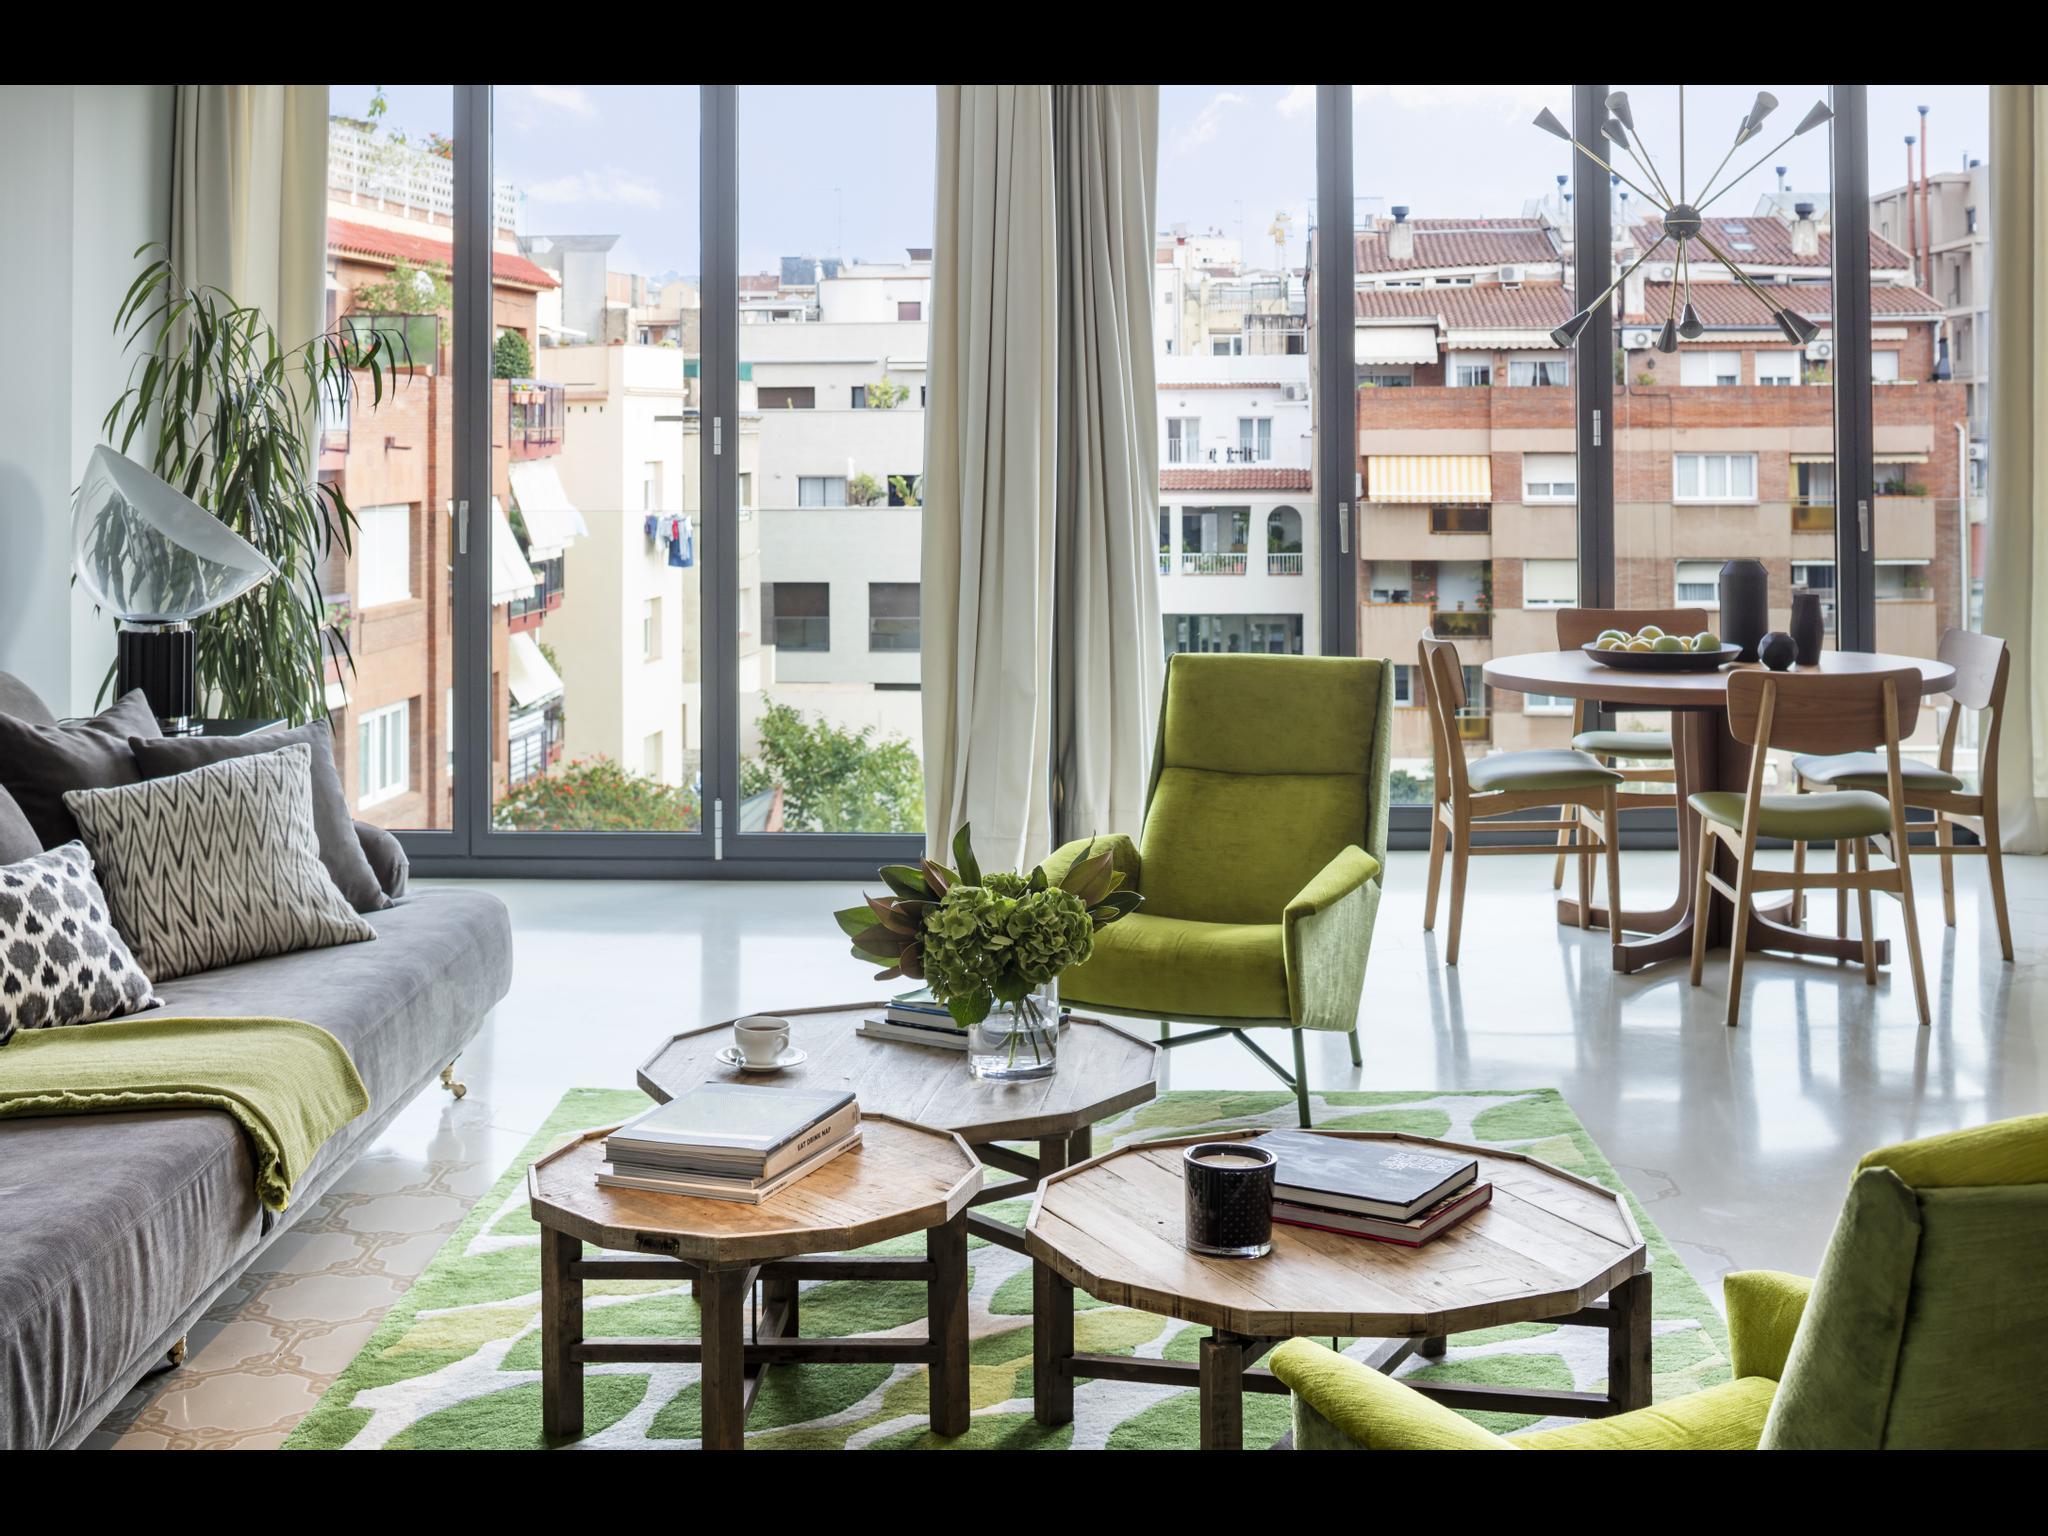 Aribau - Lujoso piso en Barcelona